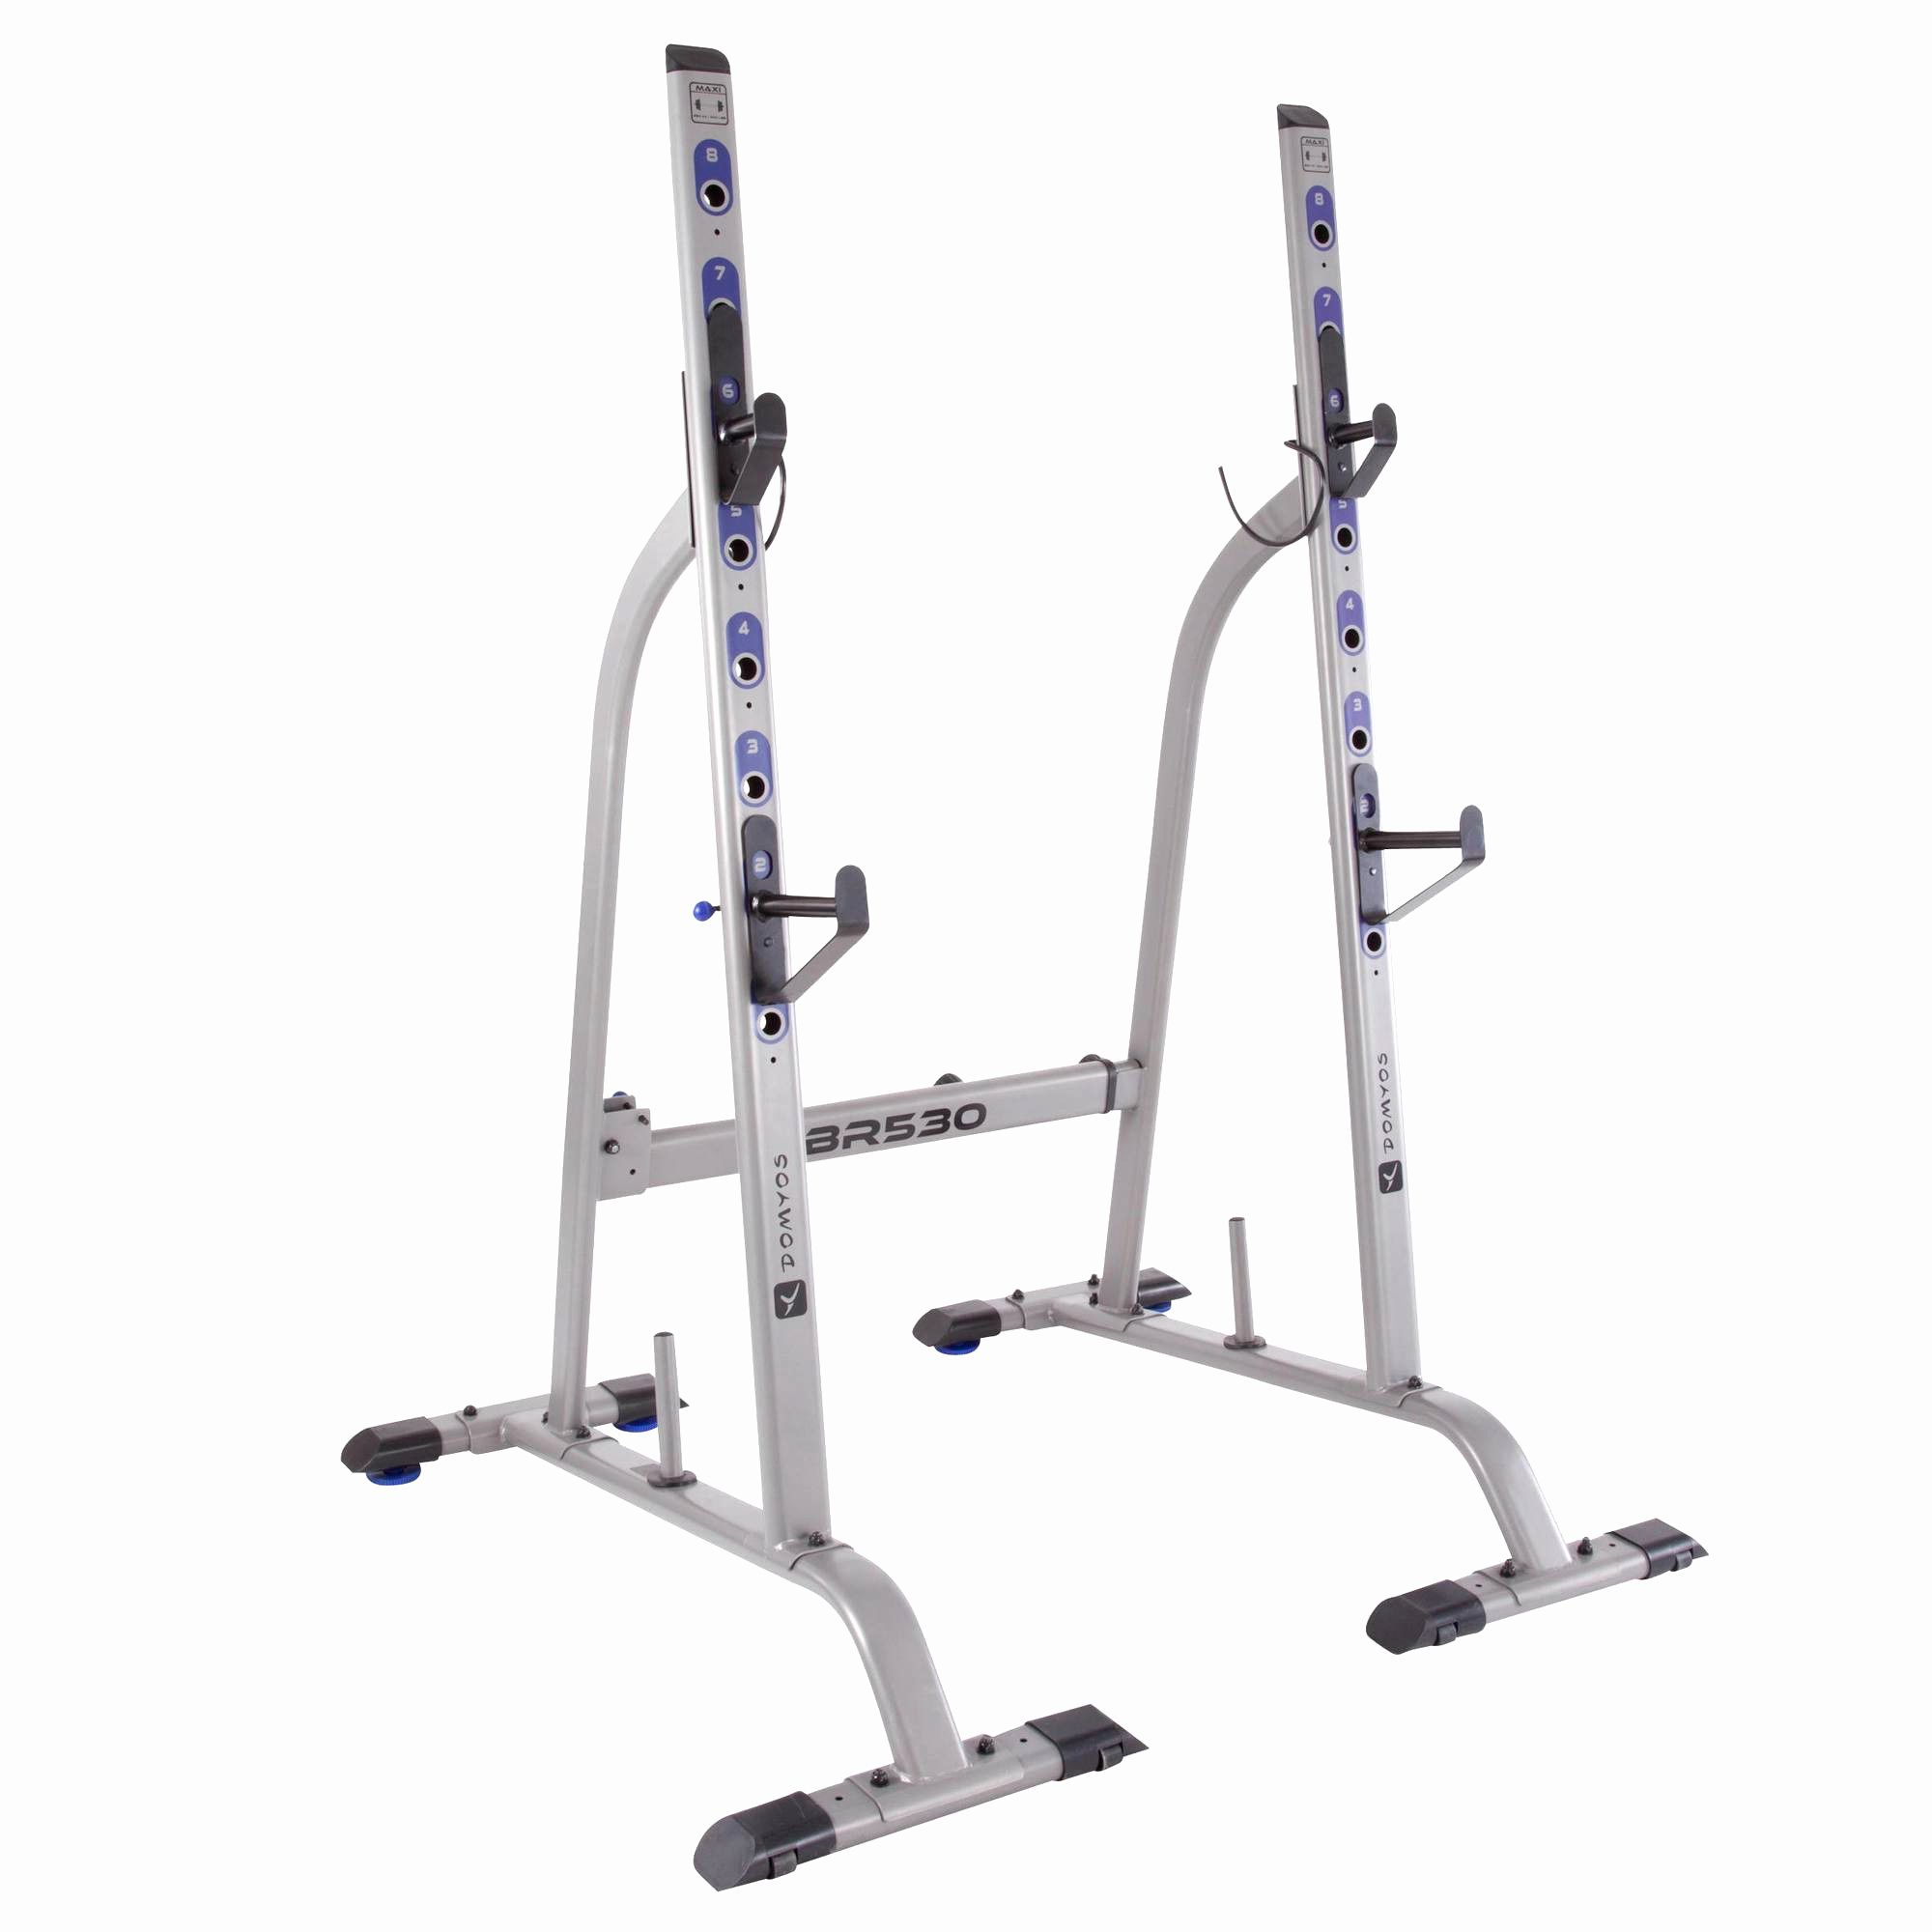 Domyos Banc De Musculation Domyos Banc De Musculation Domyos Musculation Decathlon Domyos Musculation Decathlon Equipe Squat Rack No Equipment Workout Squats